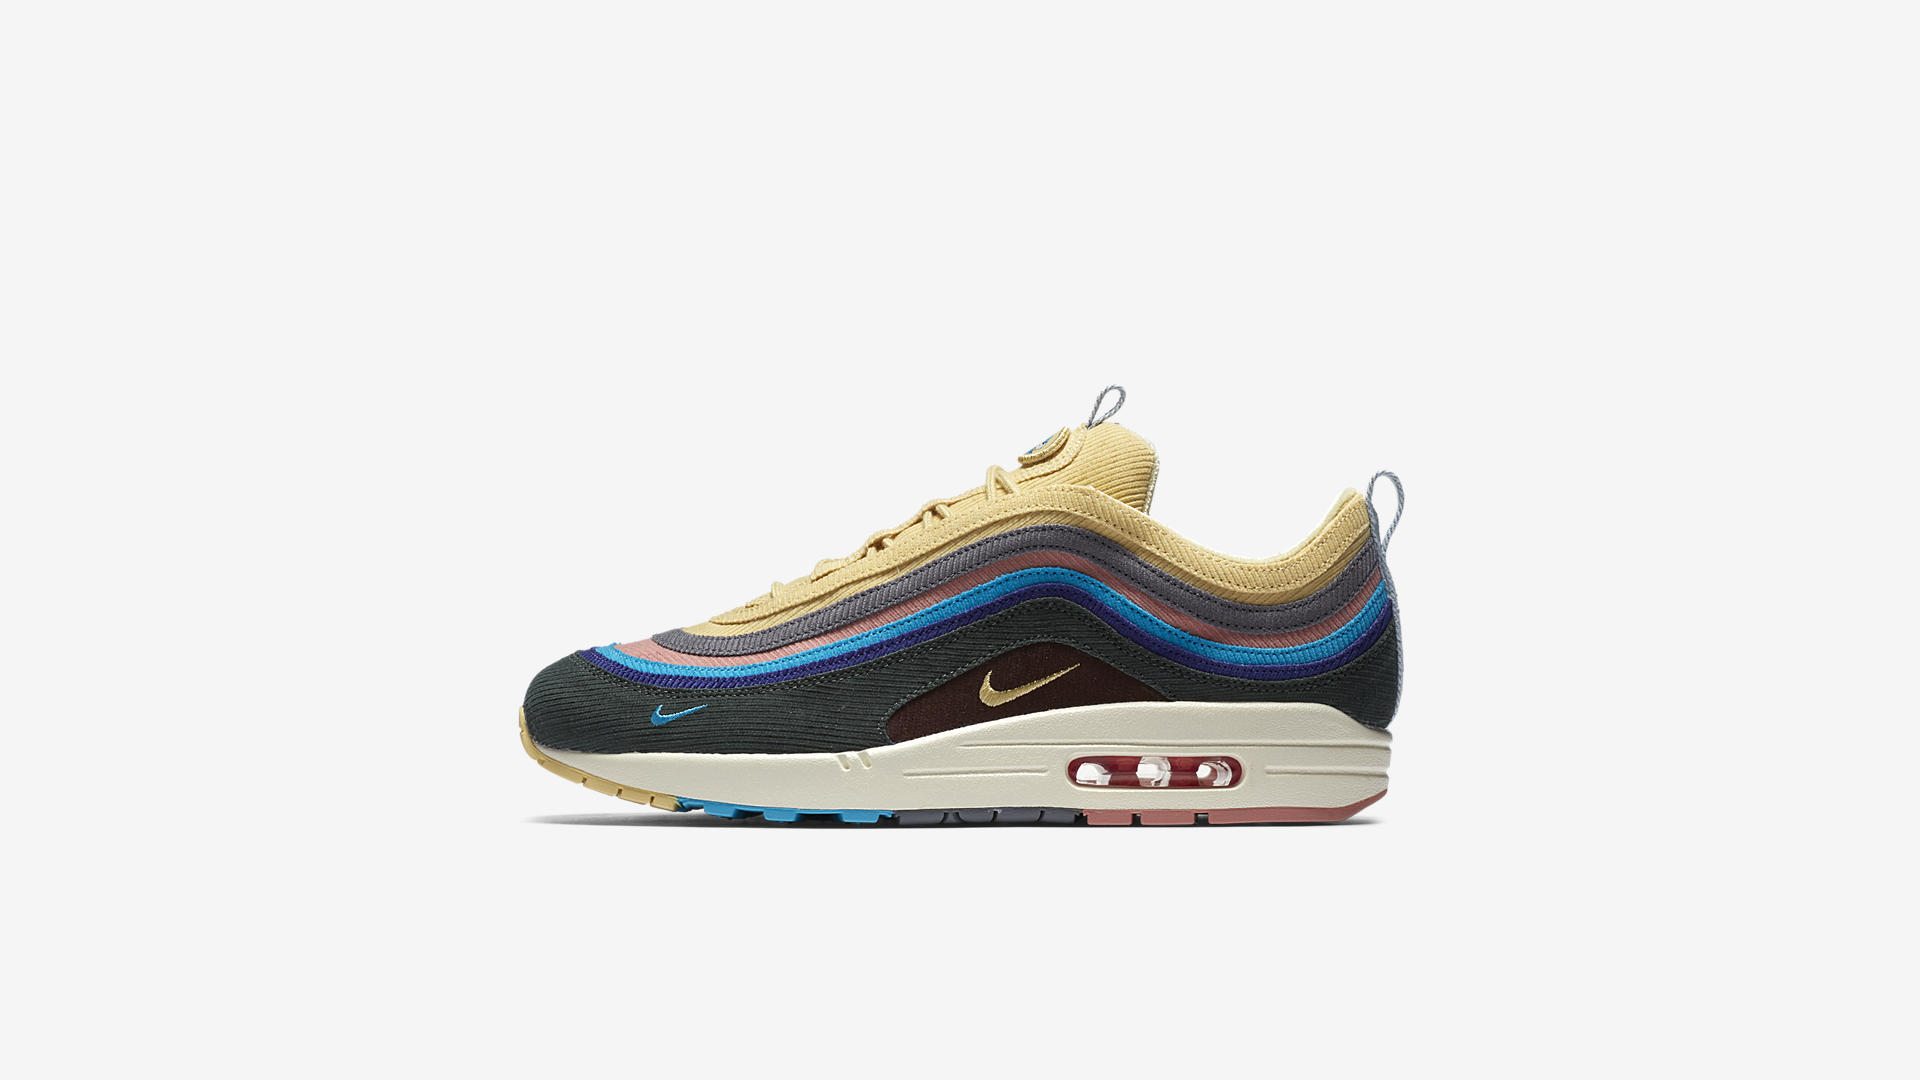 AJ4219 400 Nike Air Max 1 97 Sean Wotherspoon 5